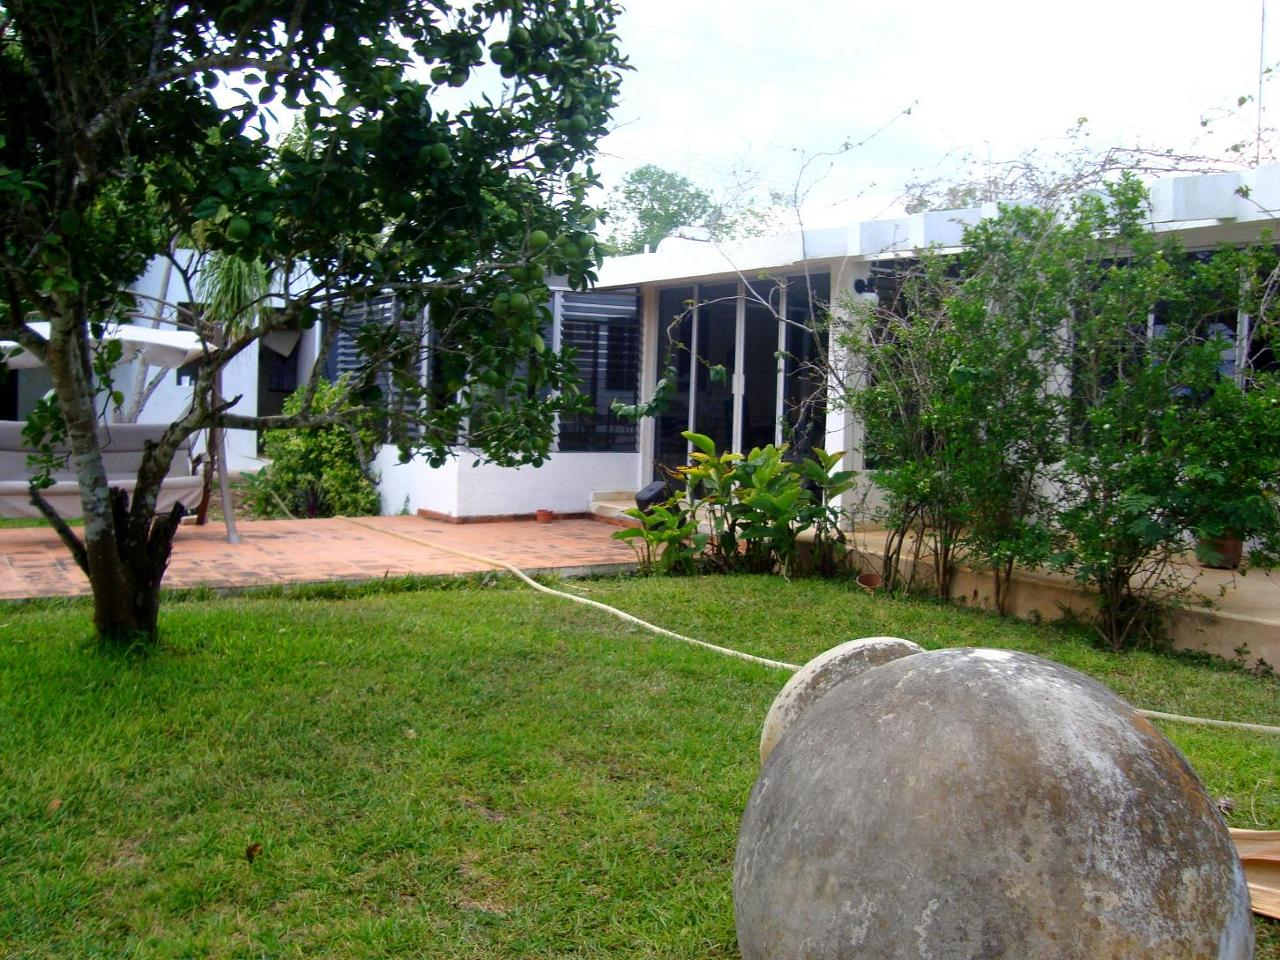 Casa en venta en Calle 17, Tamanche, Yucatán, Mérida